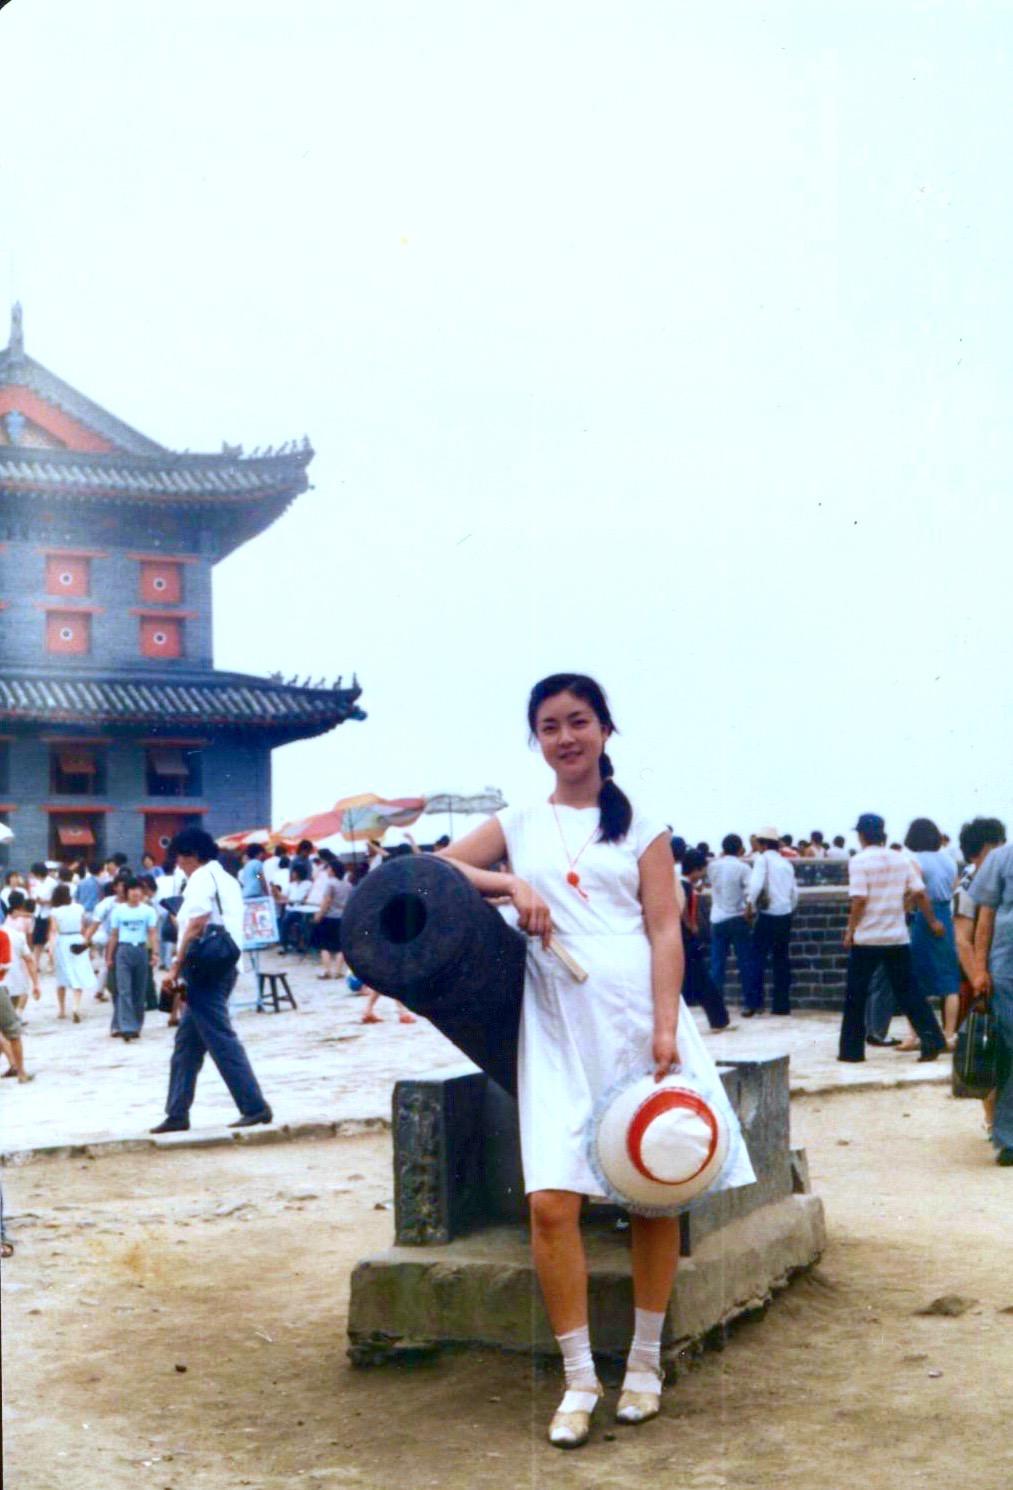 Jennifer Zeng at   ShanhaiPass      Shanhaiguan District , Qinhuangdao , Hebei province, China in 1985. 曾錚1985年攝於山海關。